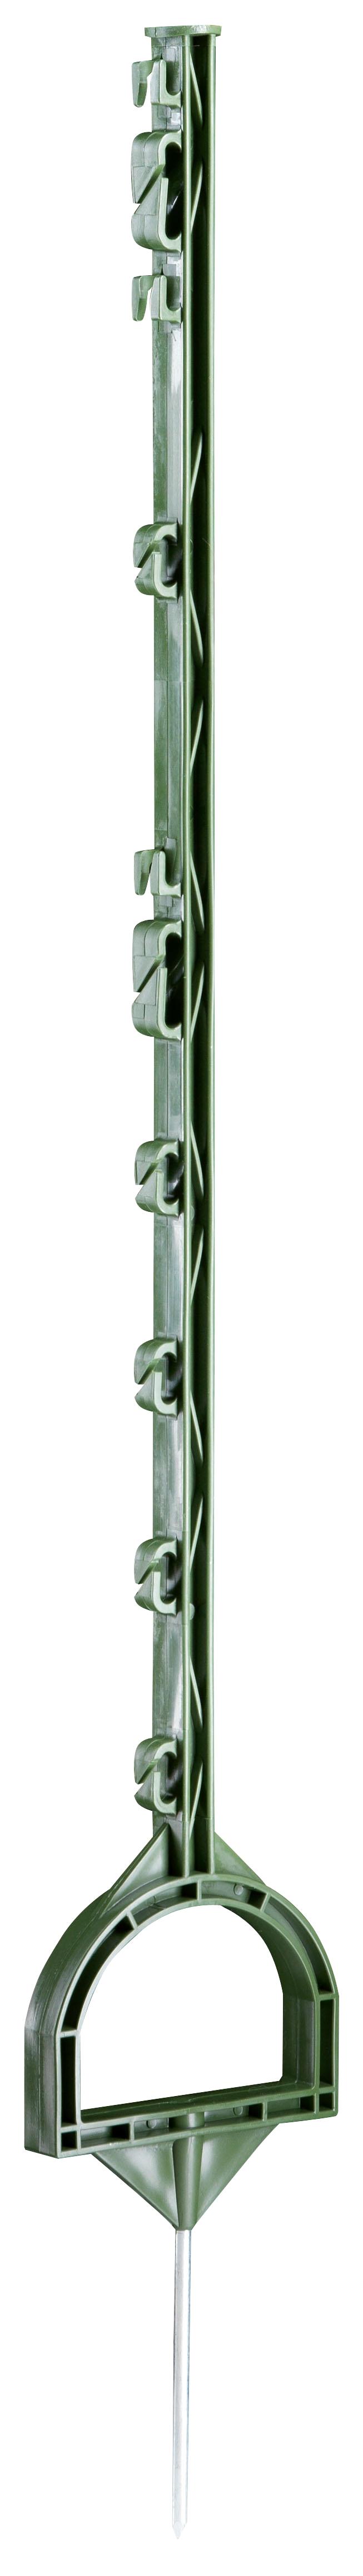 Instappaal met stijgbeugel 114 cm groen